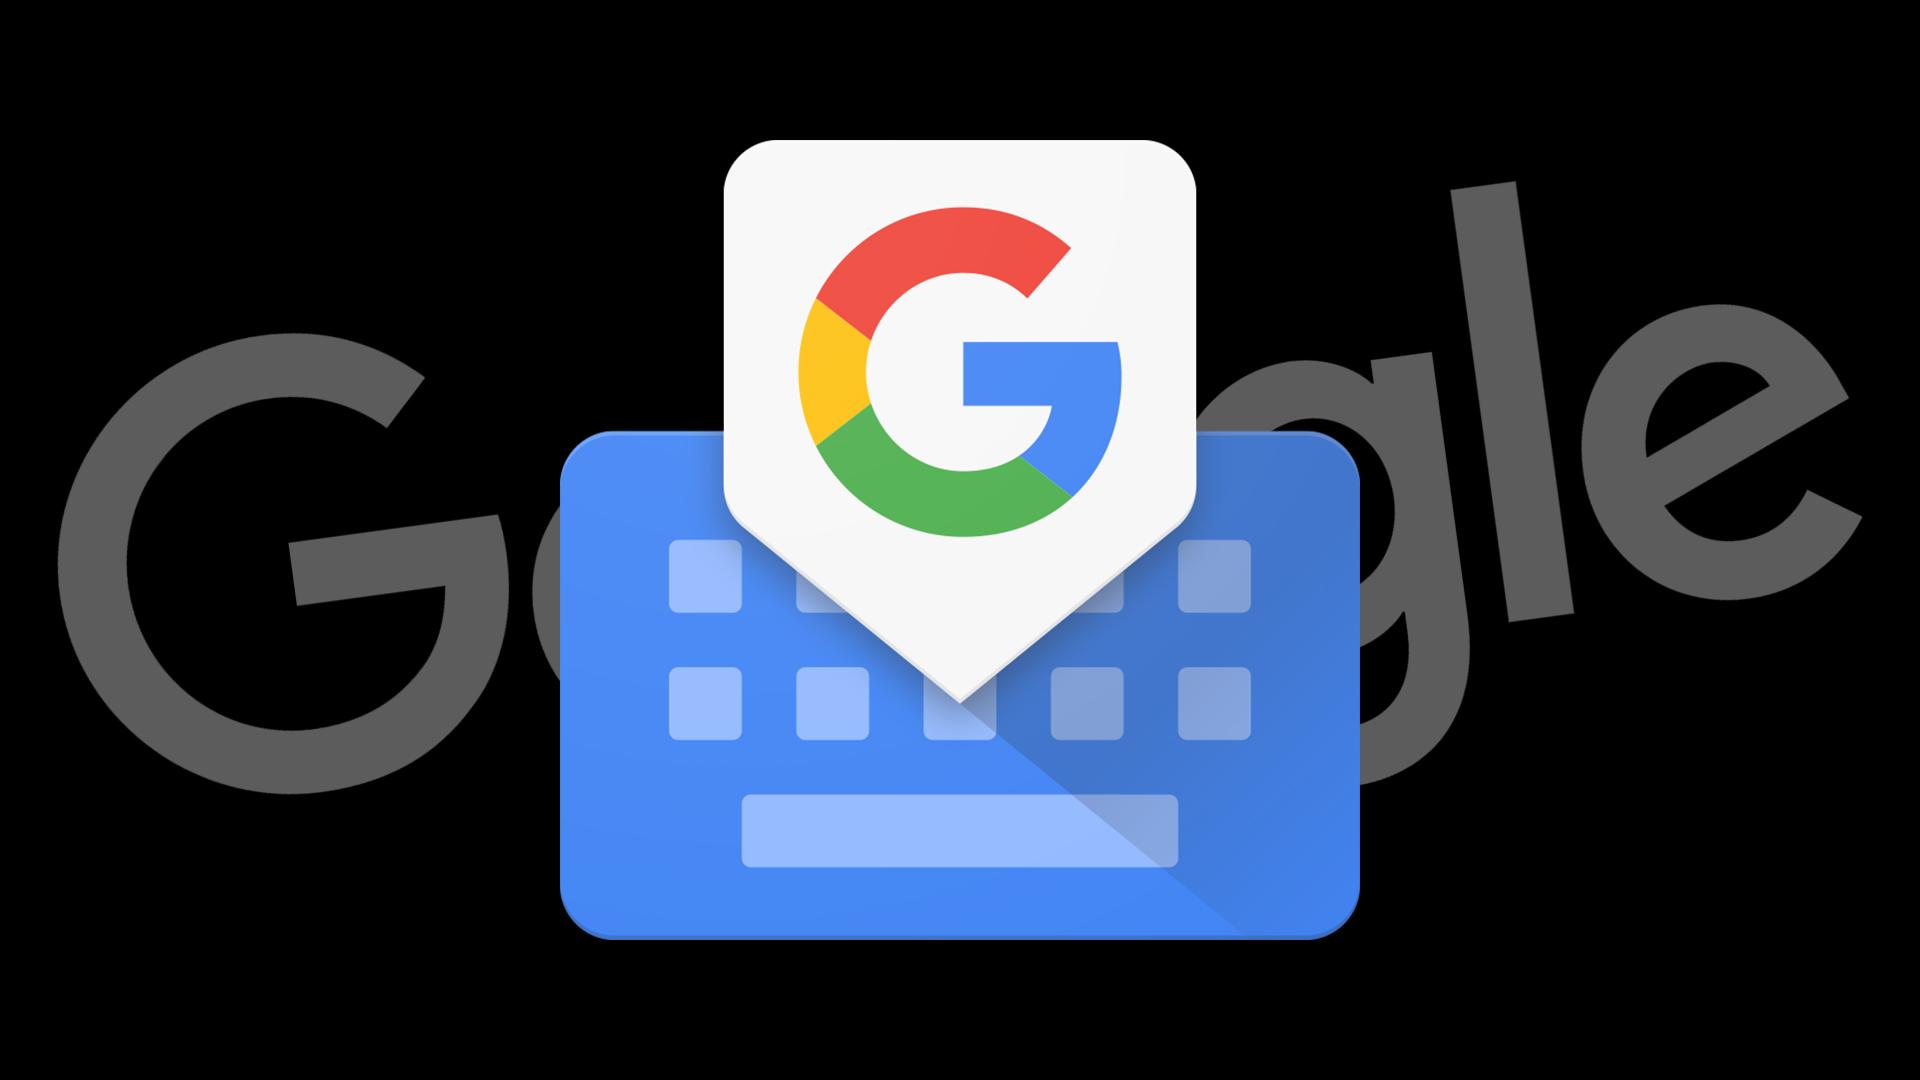 google-gboard2-1920